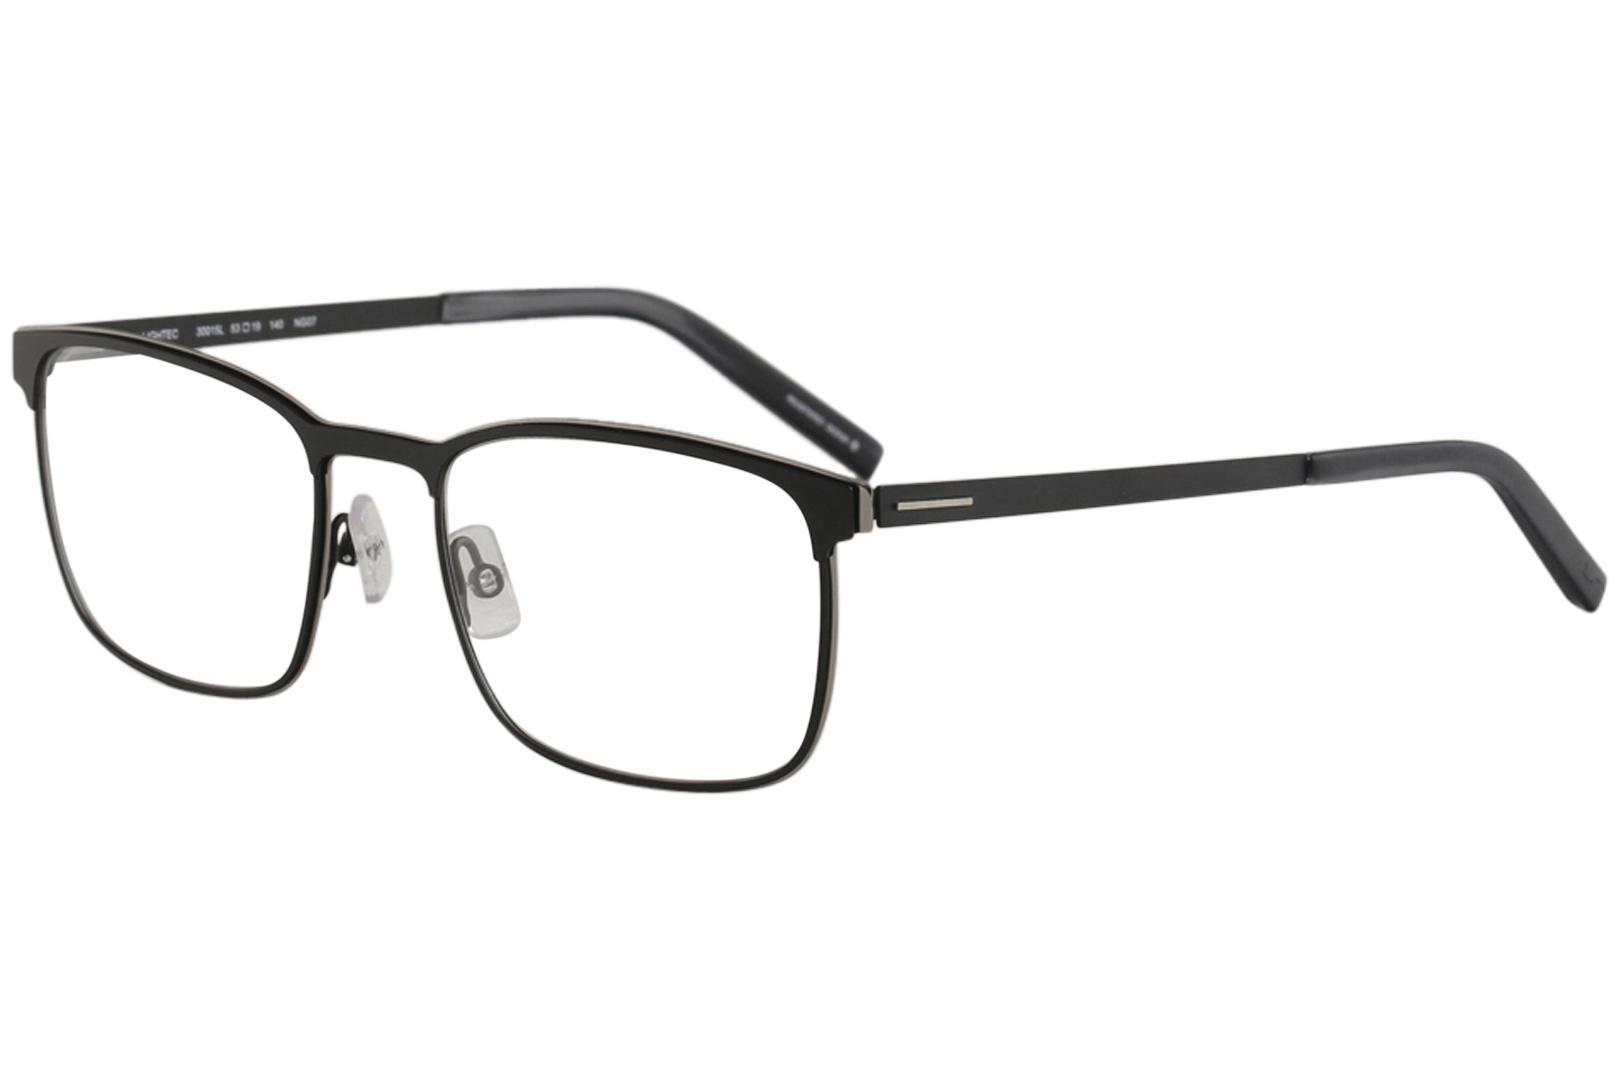 Image of Morel Men's Eyeglasses Lightec 30015L 30015/L Full Rim Optical Frame - Black - Lens 53 Bridge 19 Temple 140mm